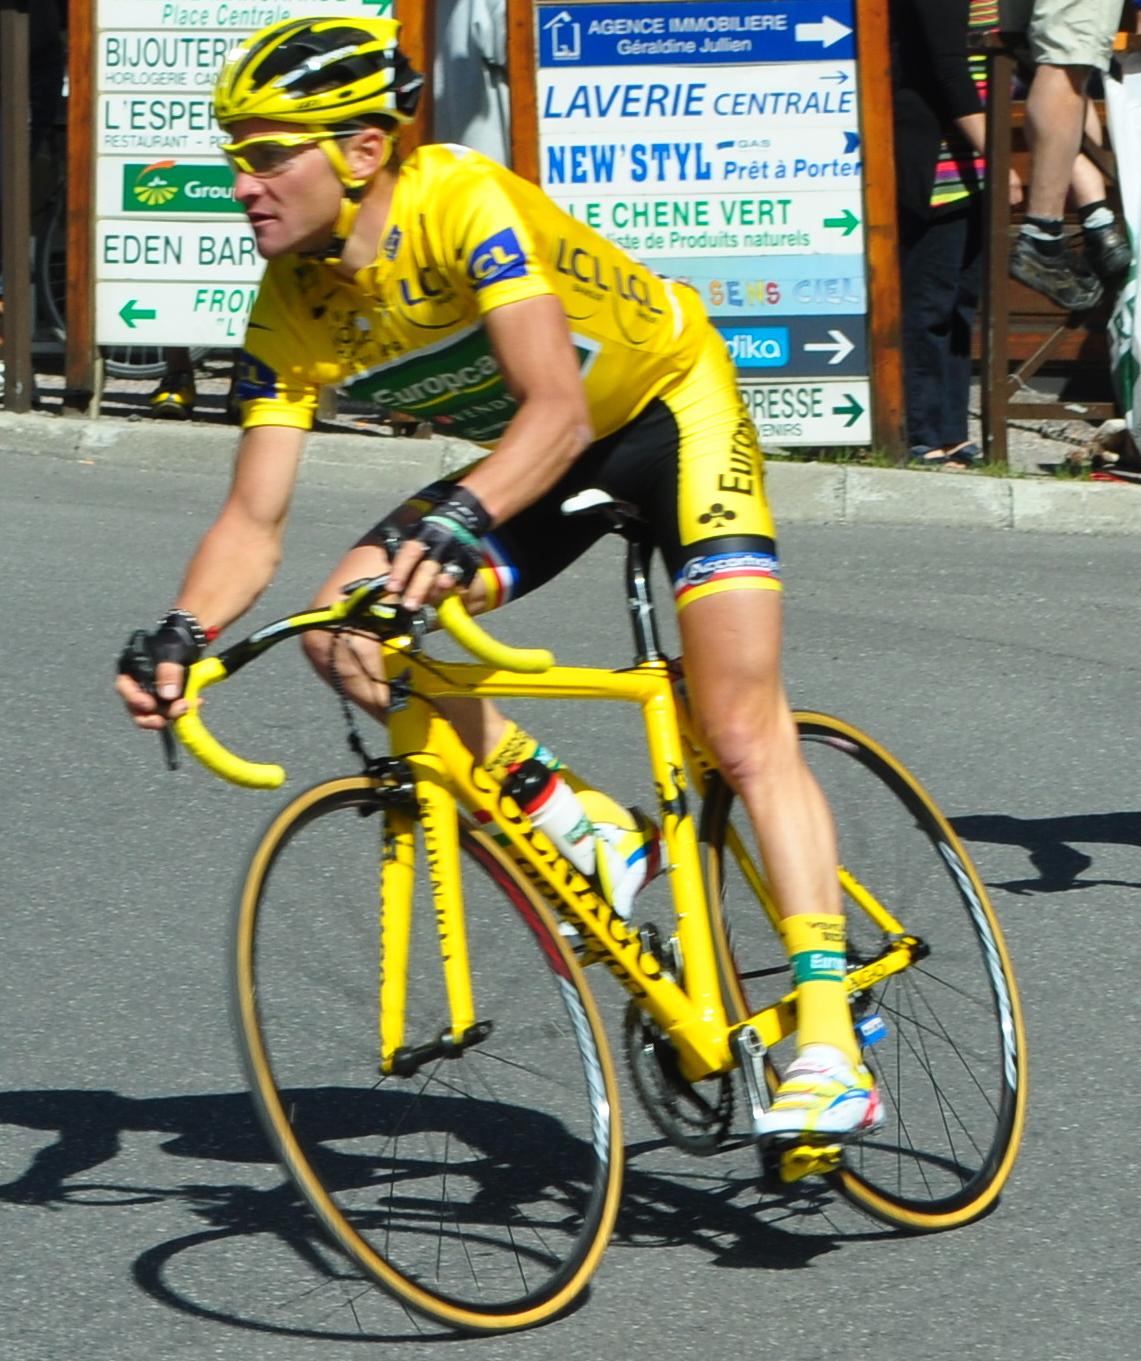 Tour La Riojena Cuervo